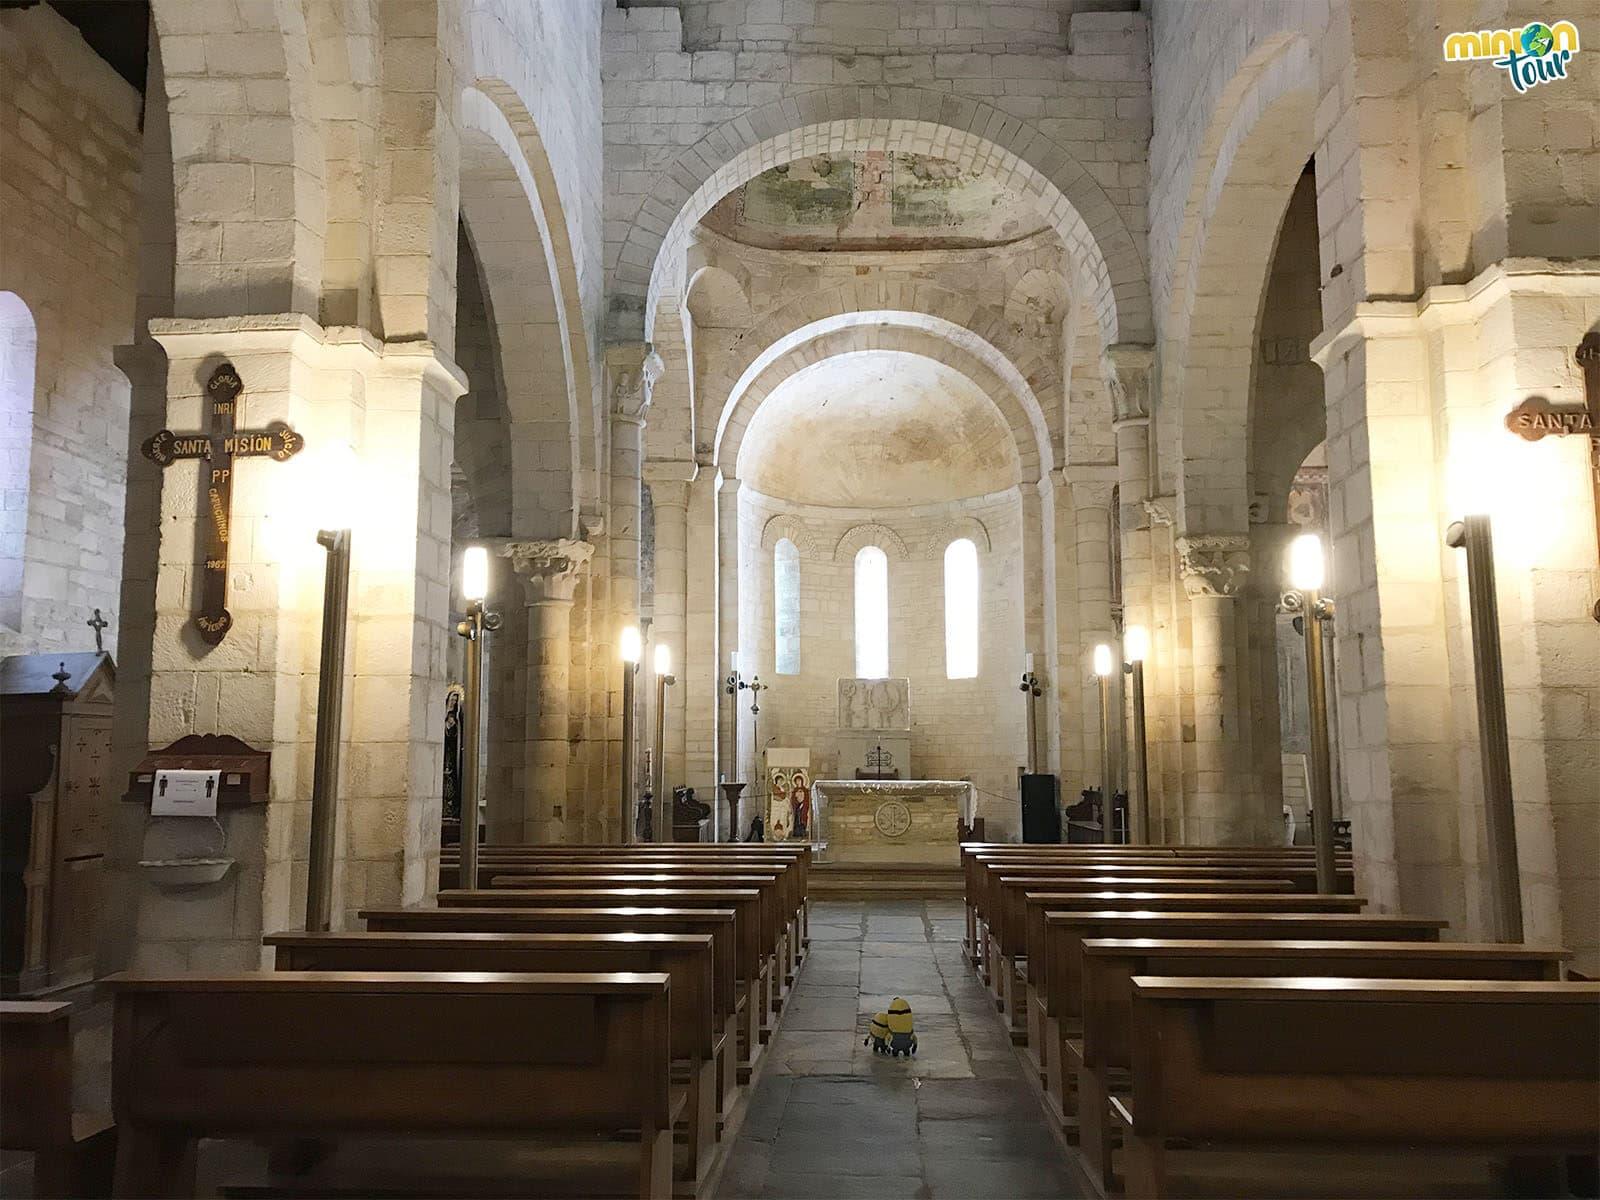 Minions en la Basílica de San Martiño de Mondoñedo